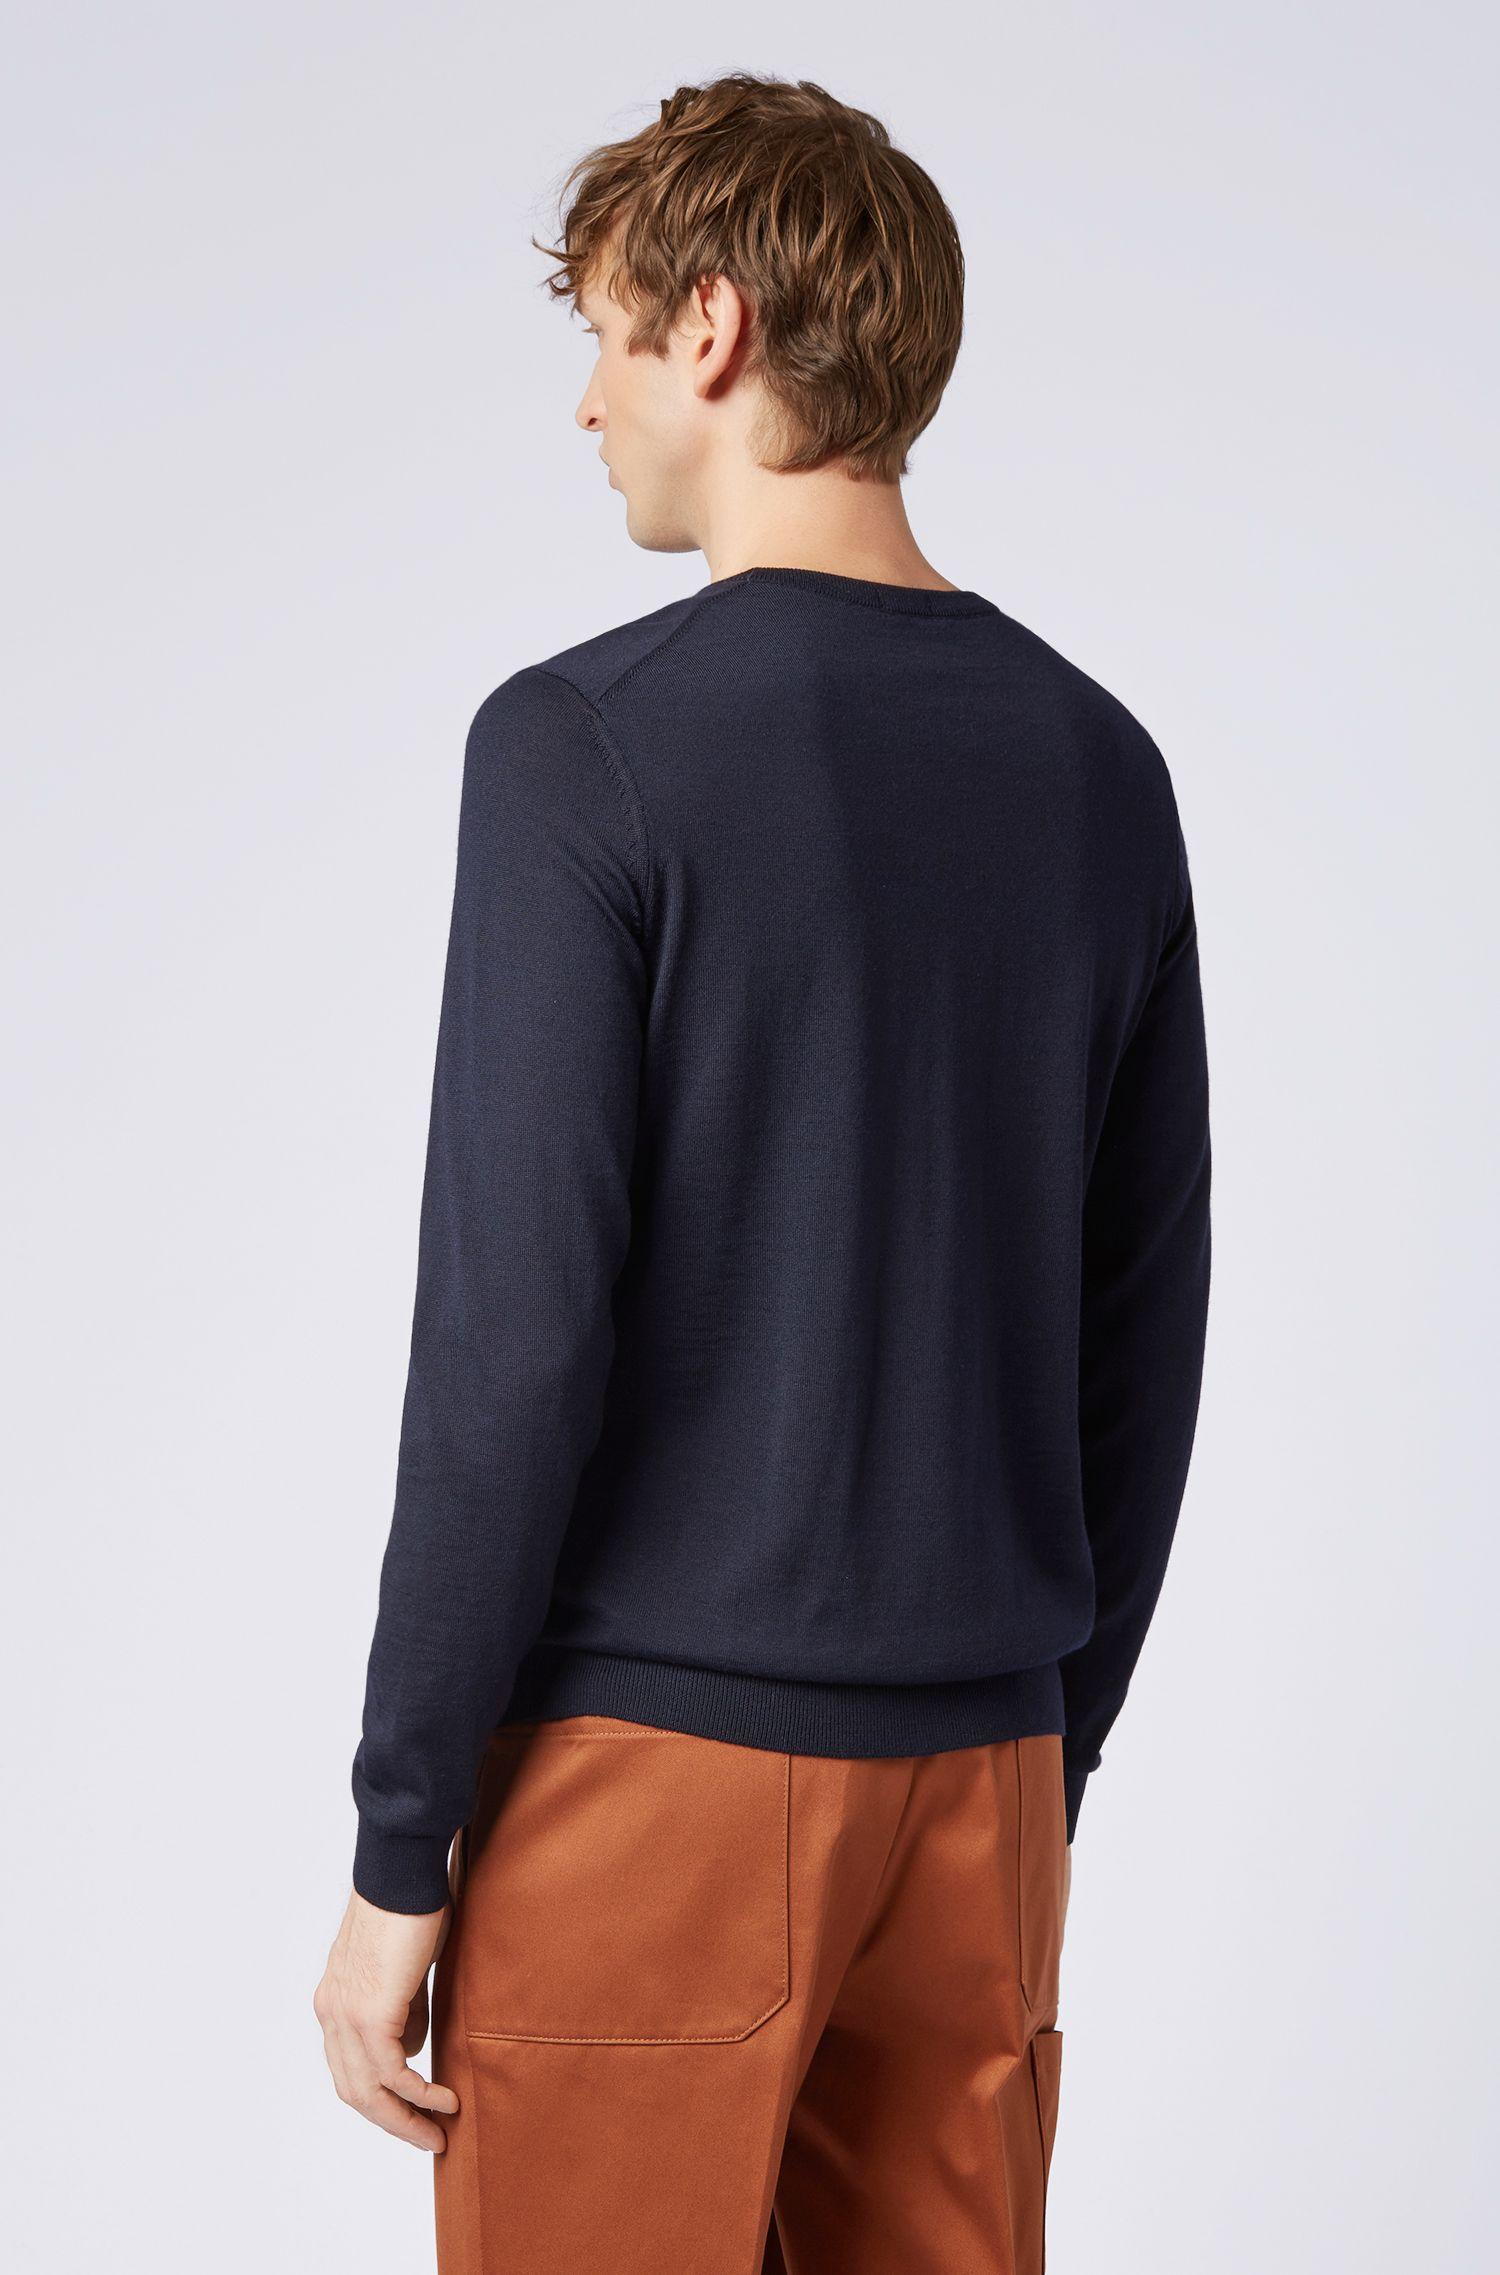 Hugo Boss - Jersey de cuello redondo en lana virgen - 4